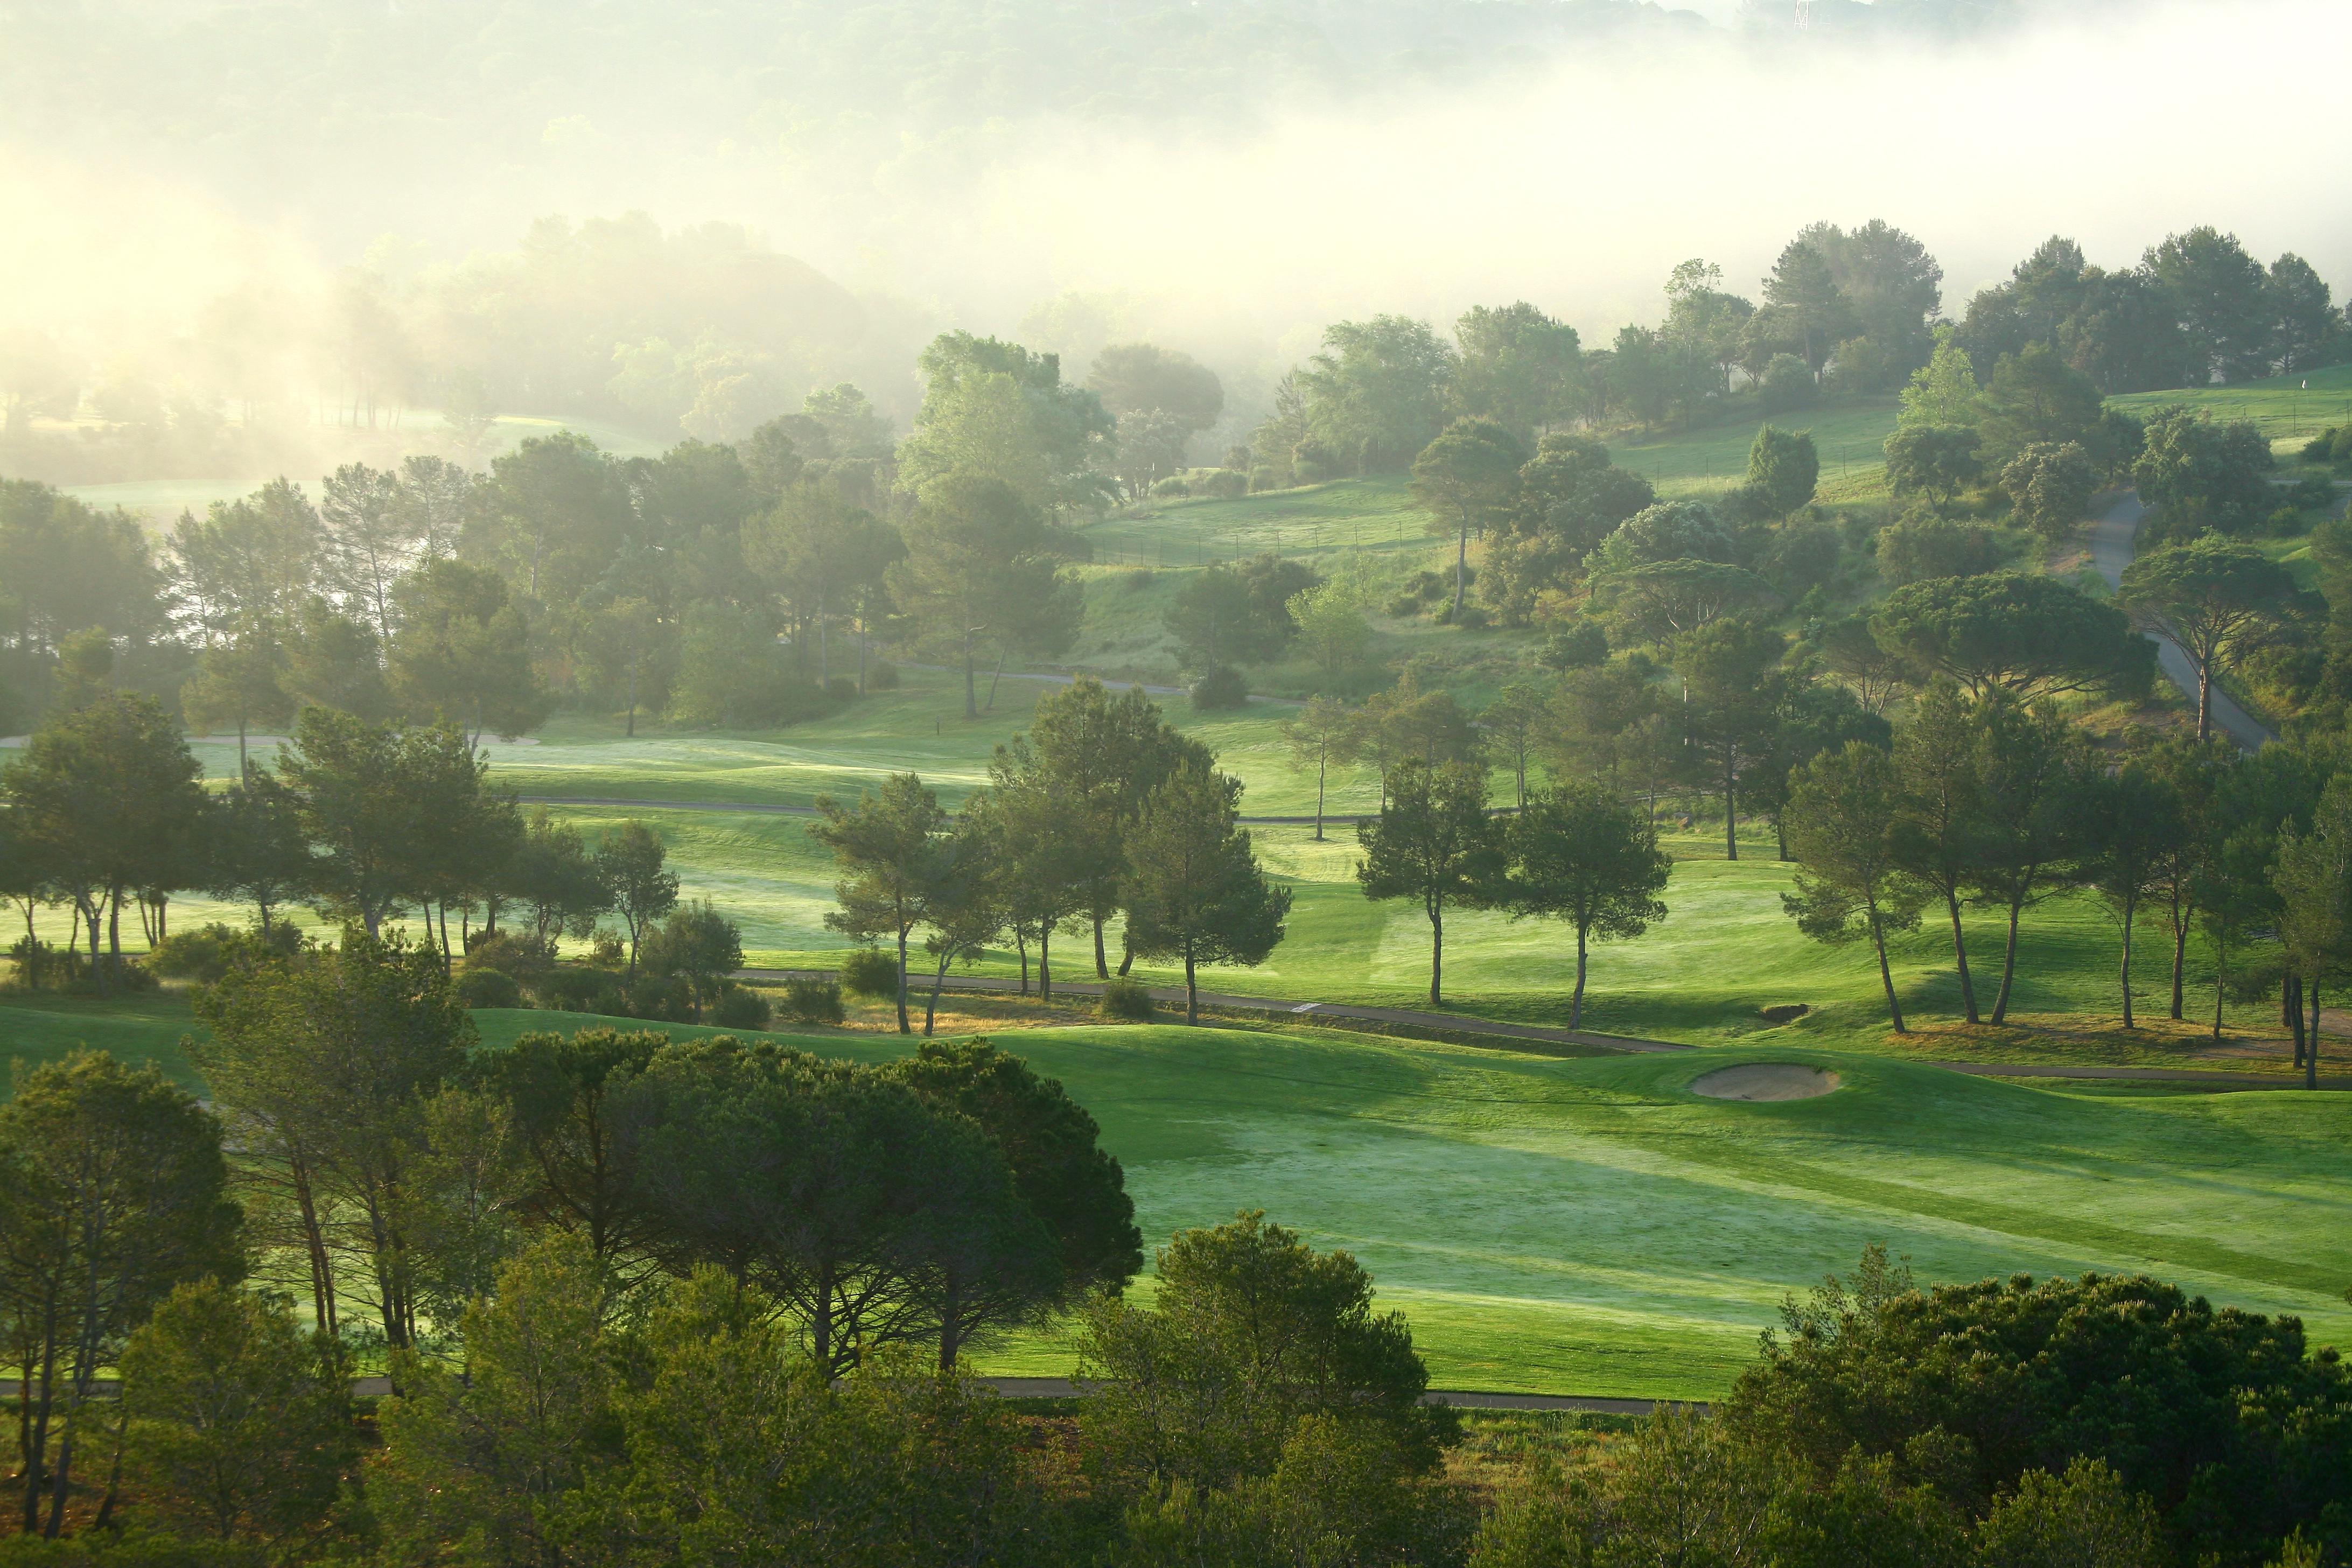 golf-expedition-golf-reizen-frankrijk-regio-cote-d'azur-Les-Domaines-de-Saint-Endréol-Golf-en-Spa-Resort-mistige-golfbaan